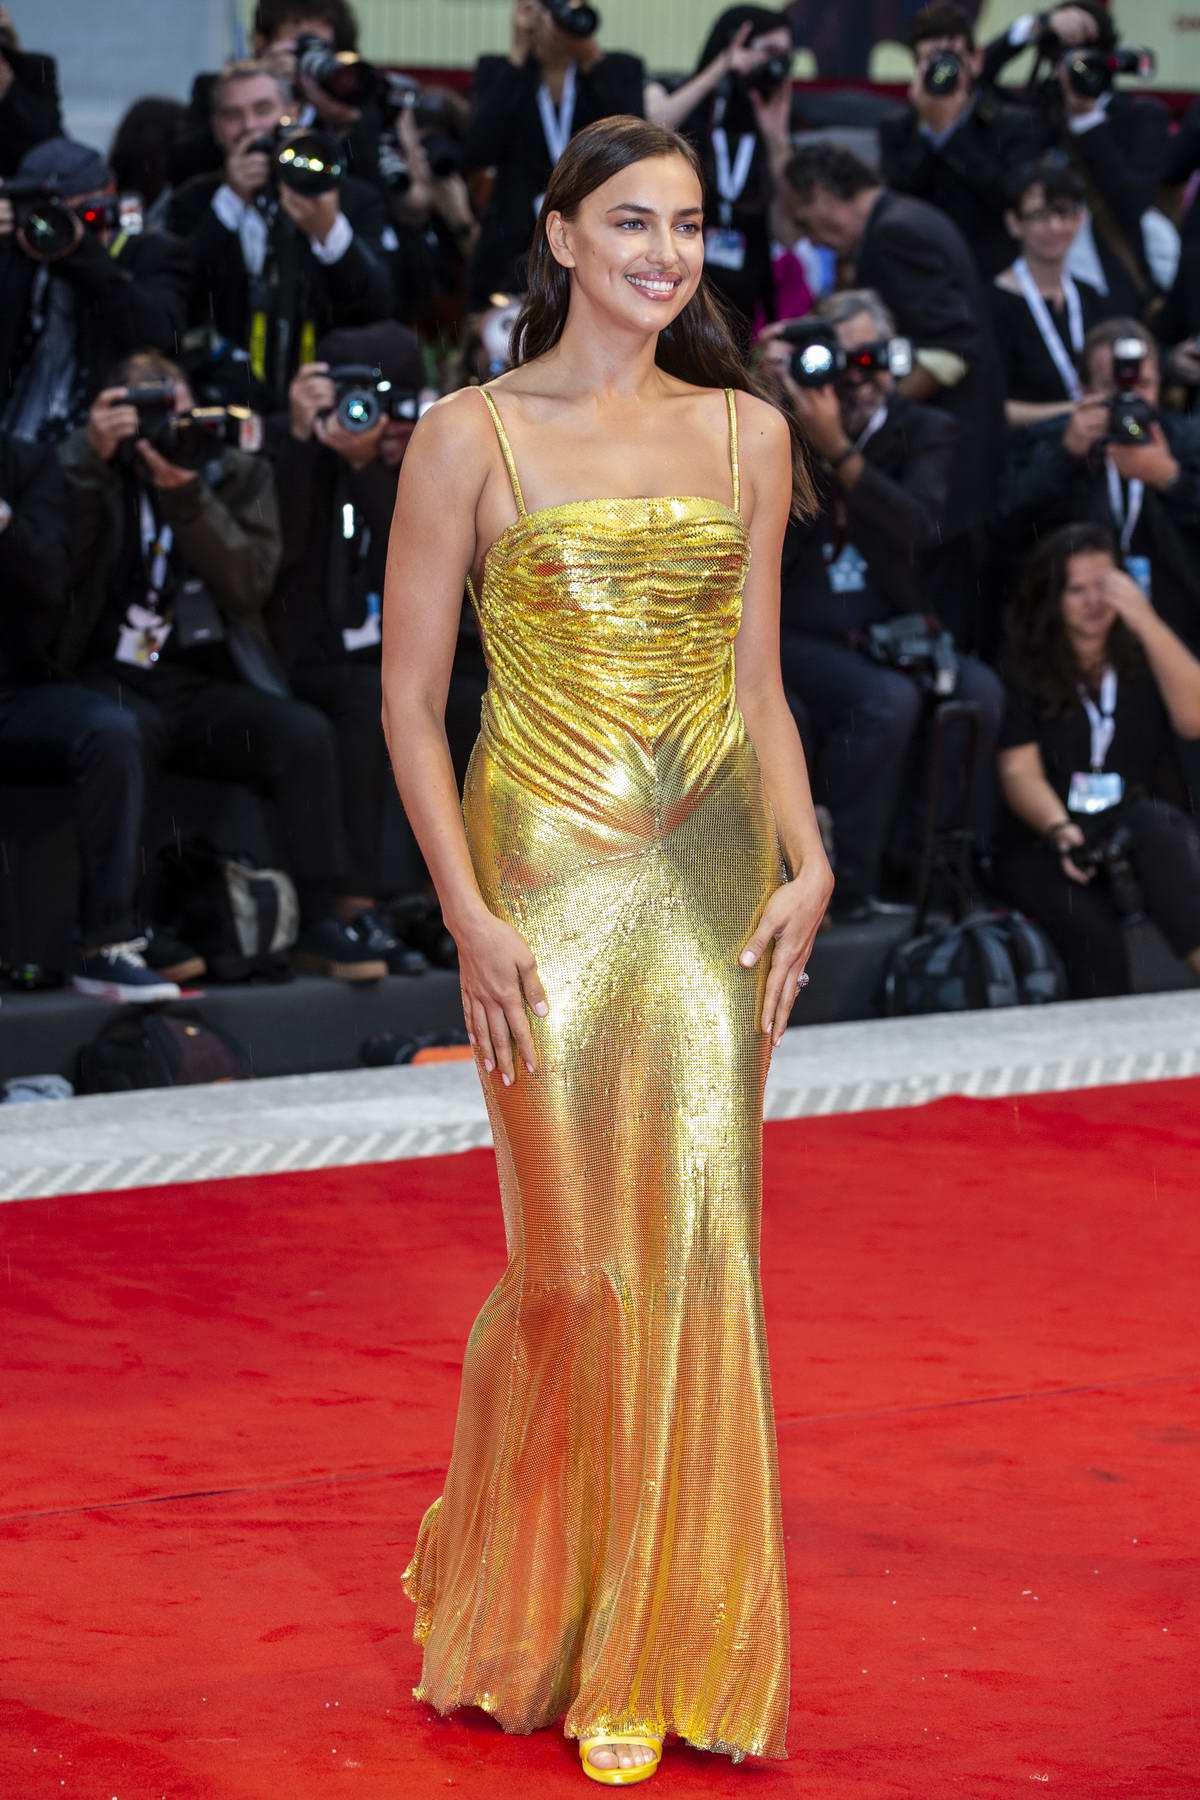 Irina Shayk and Donatella Versace attends 'A Star Is Born' premiere during the 75th Venice Film Festival in Venice, Italy